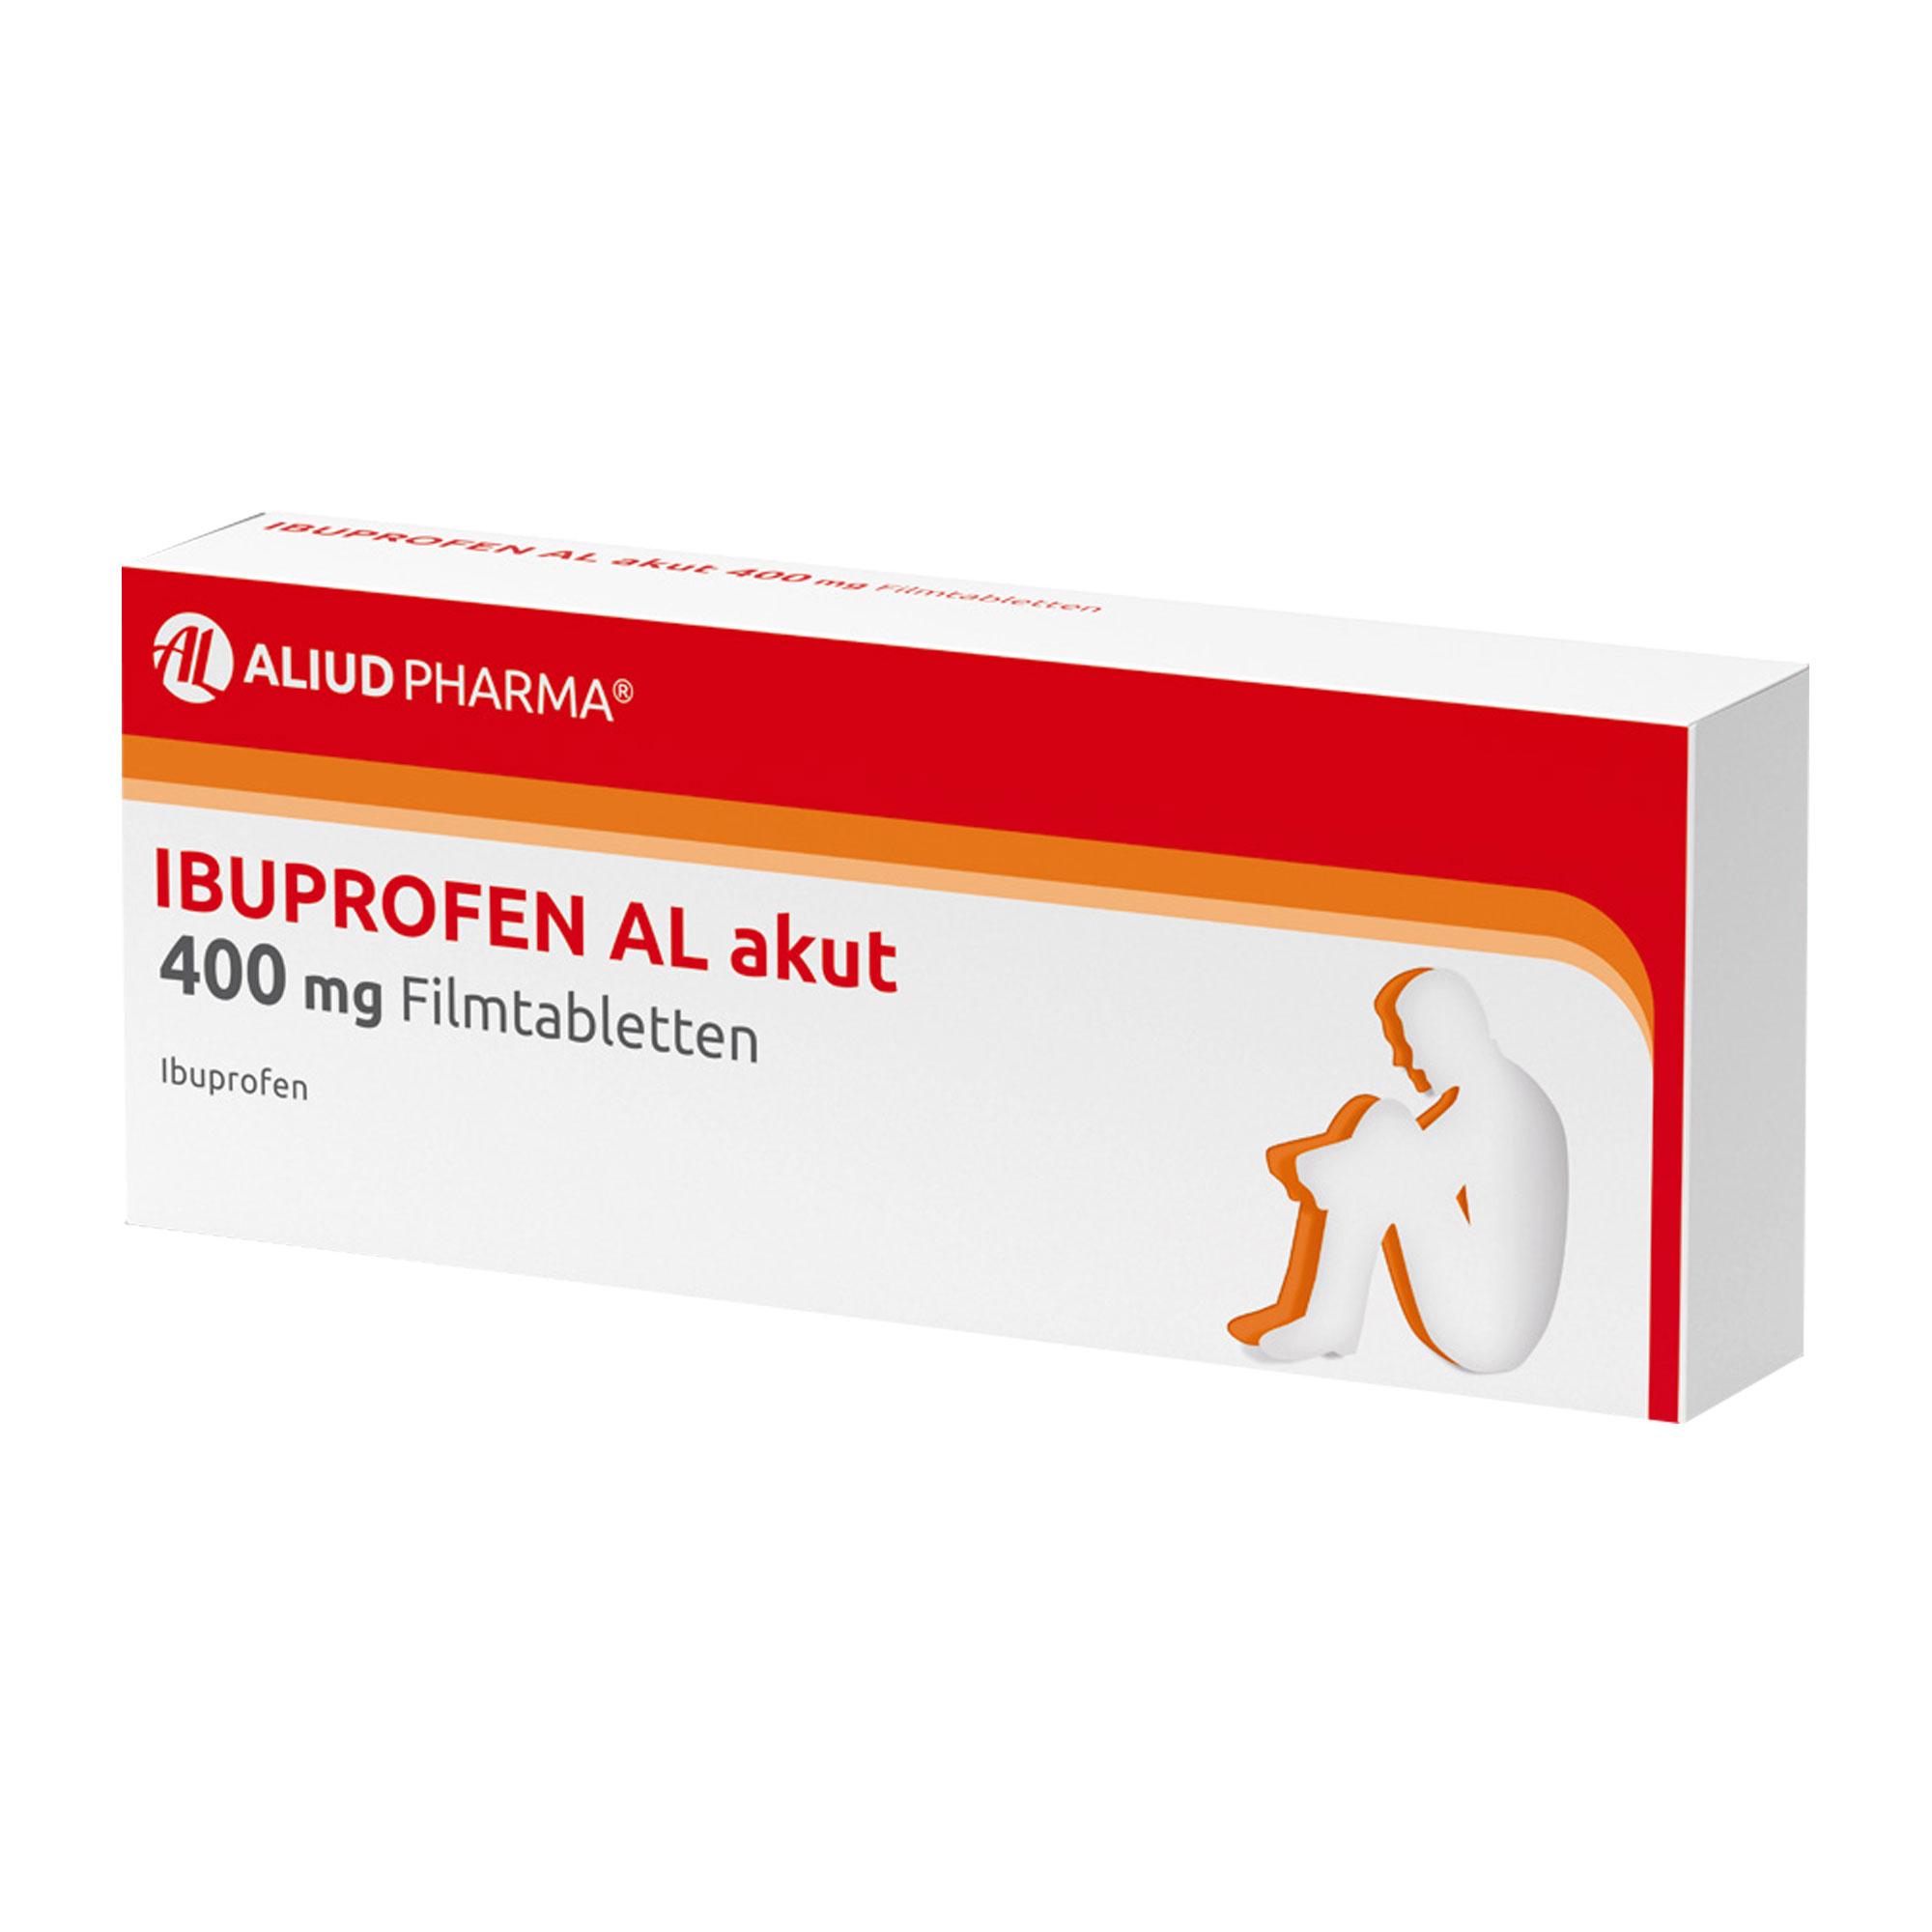 Ibuprofen AL akut 400 mg